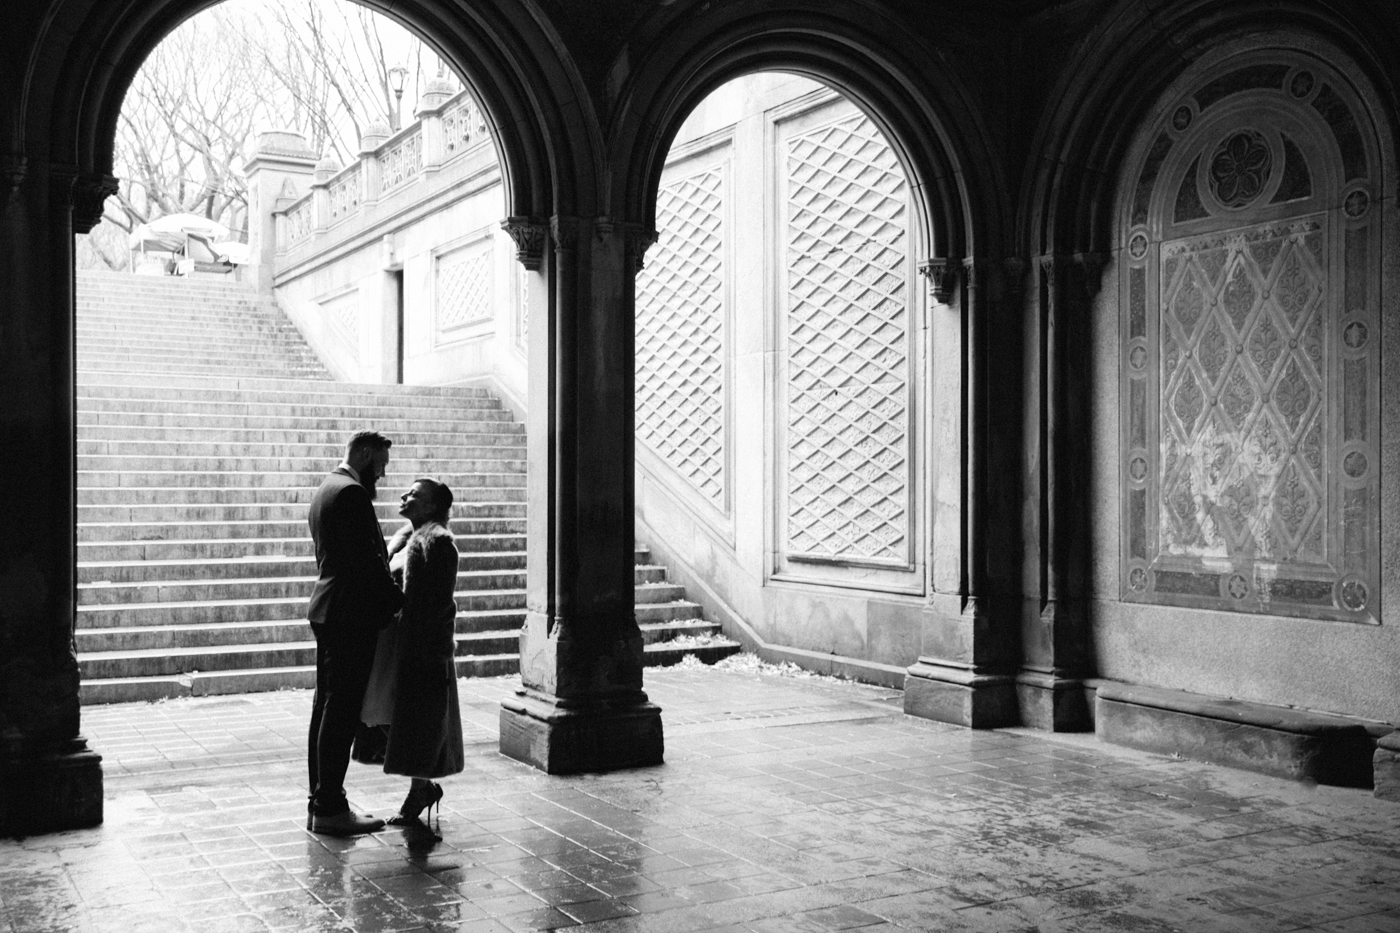 Central-park-wedding-by-Tanya-Isaeva-79.jpg